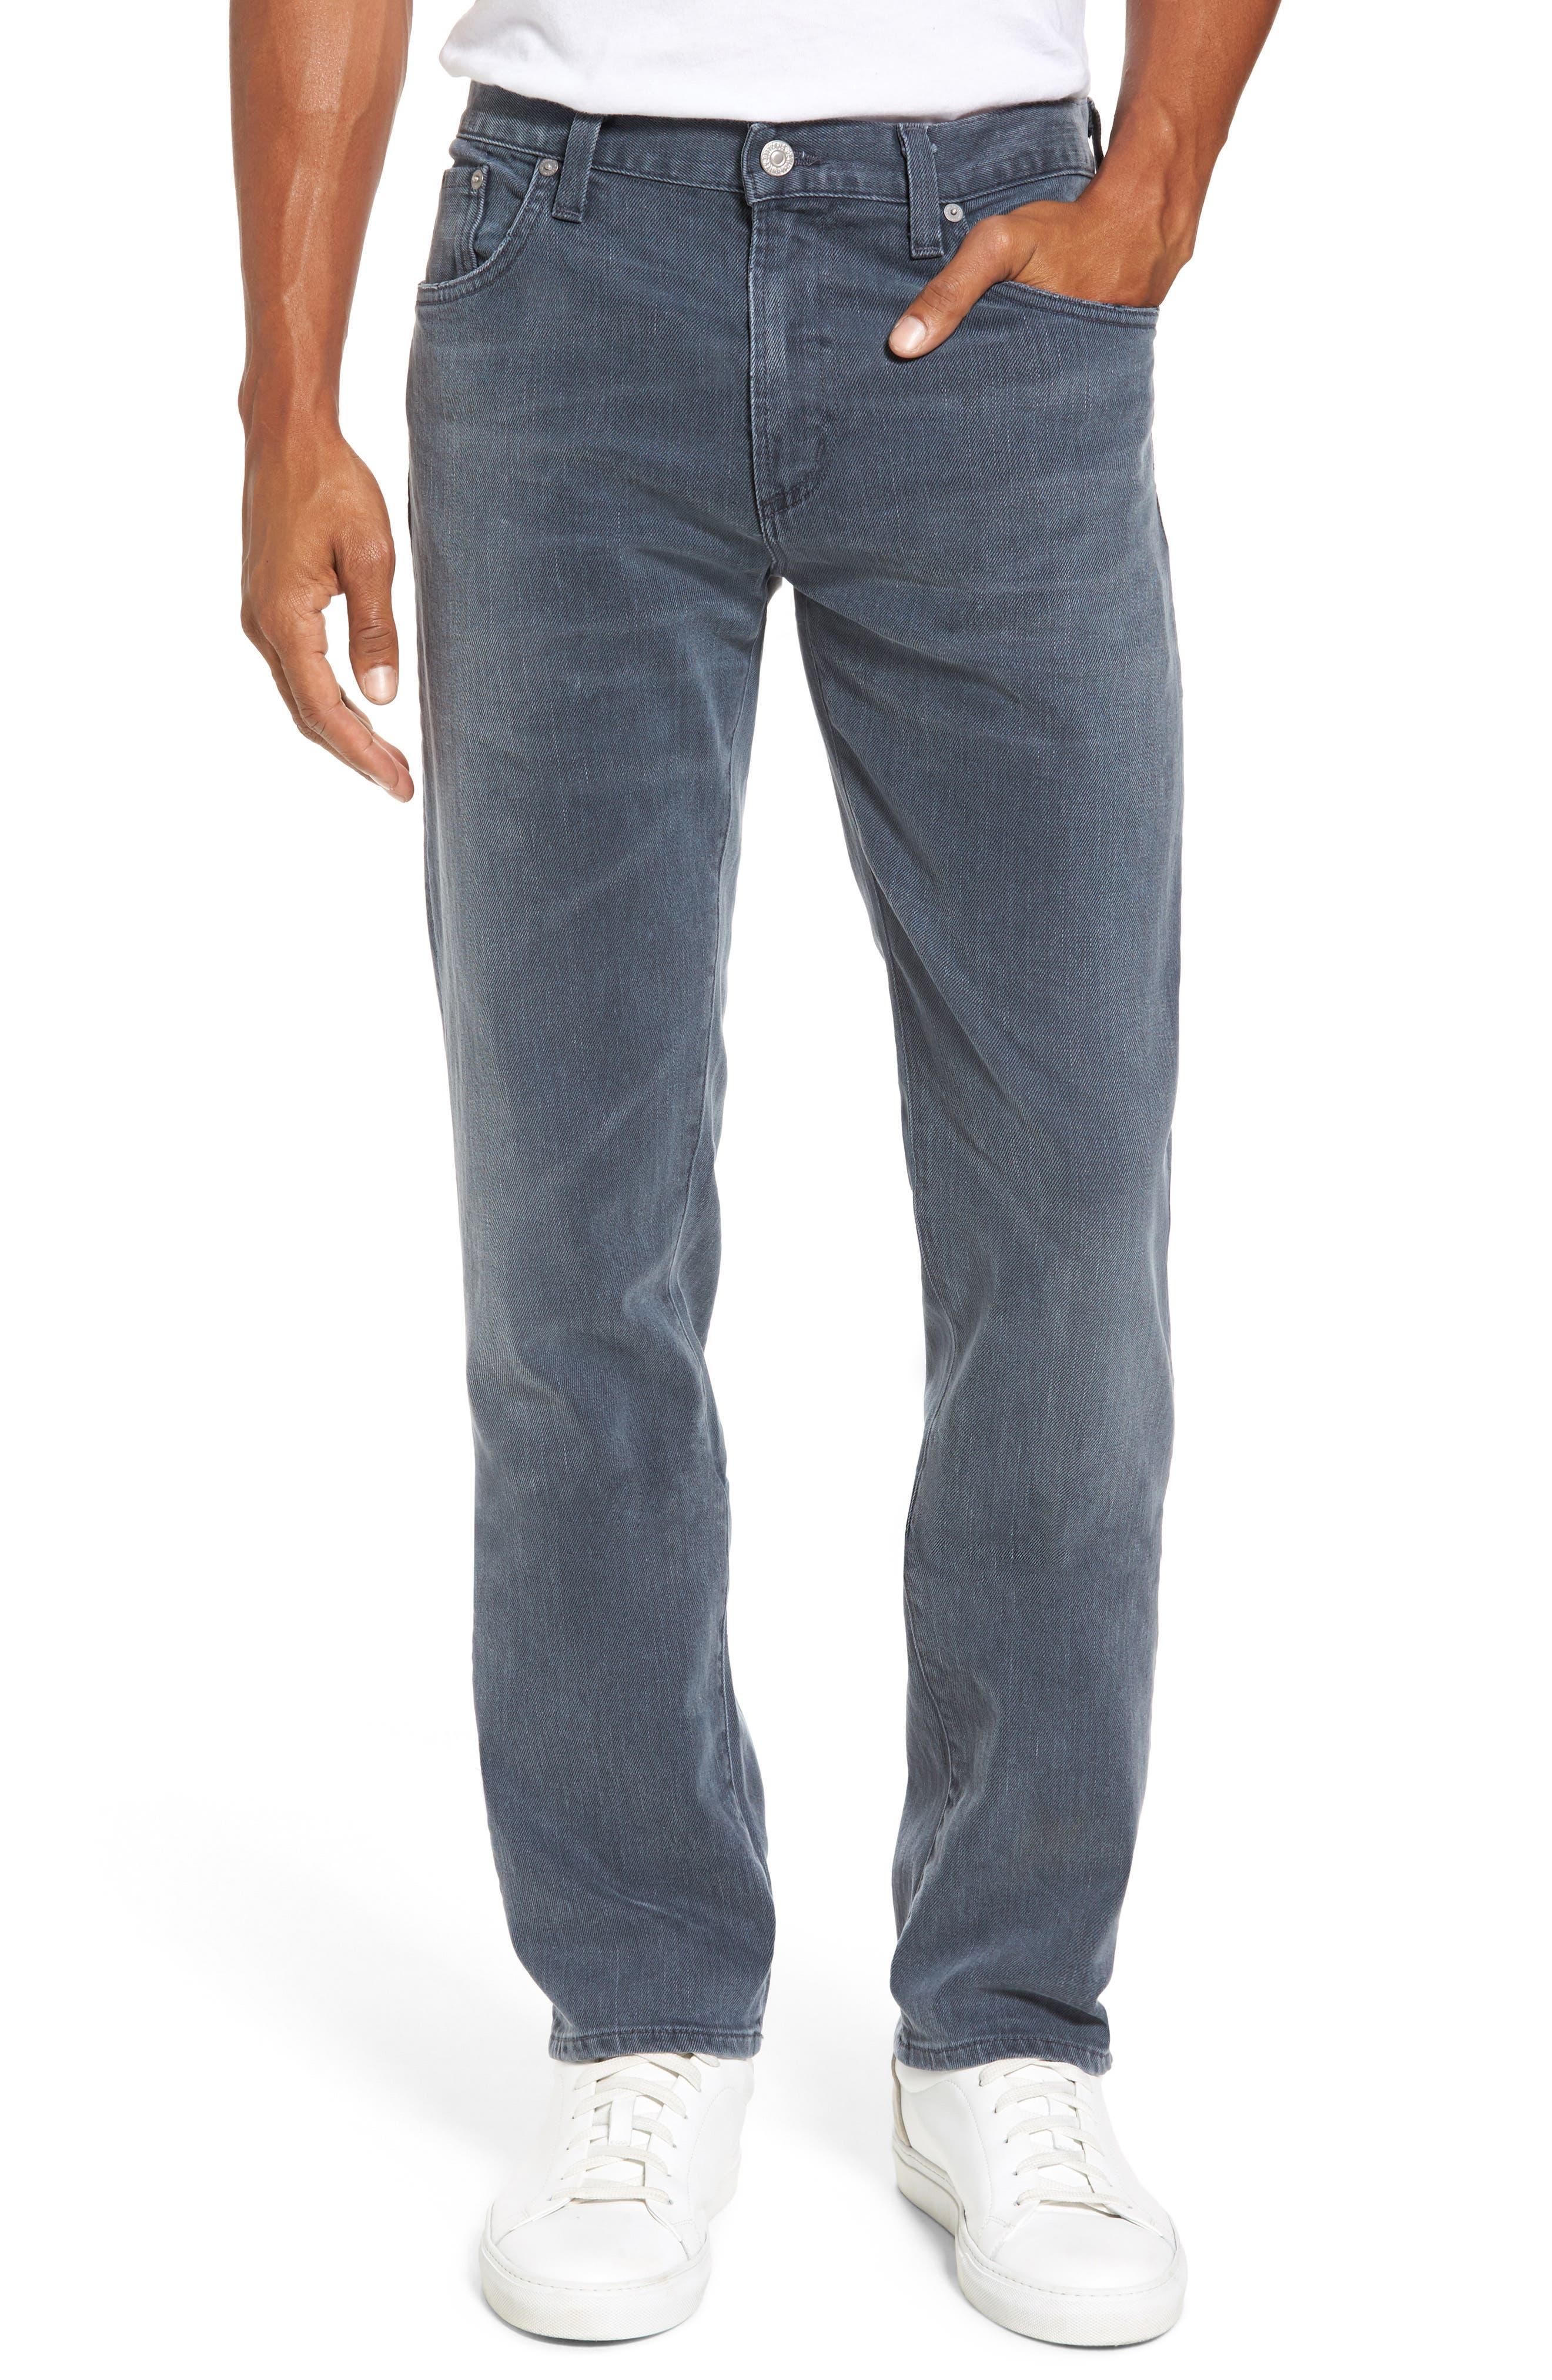 Core Slim Fit Jeans,                             Main thumbnail 1, color,                             Grey Skies